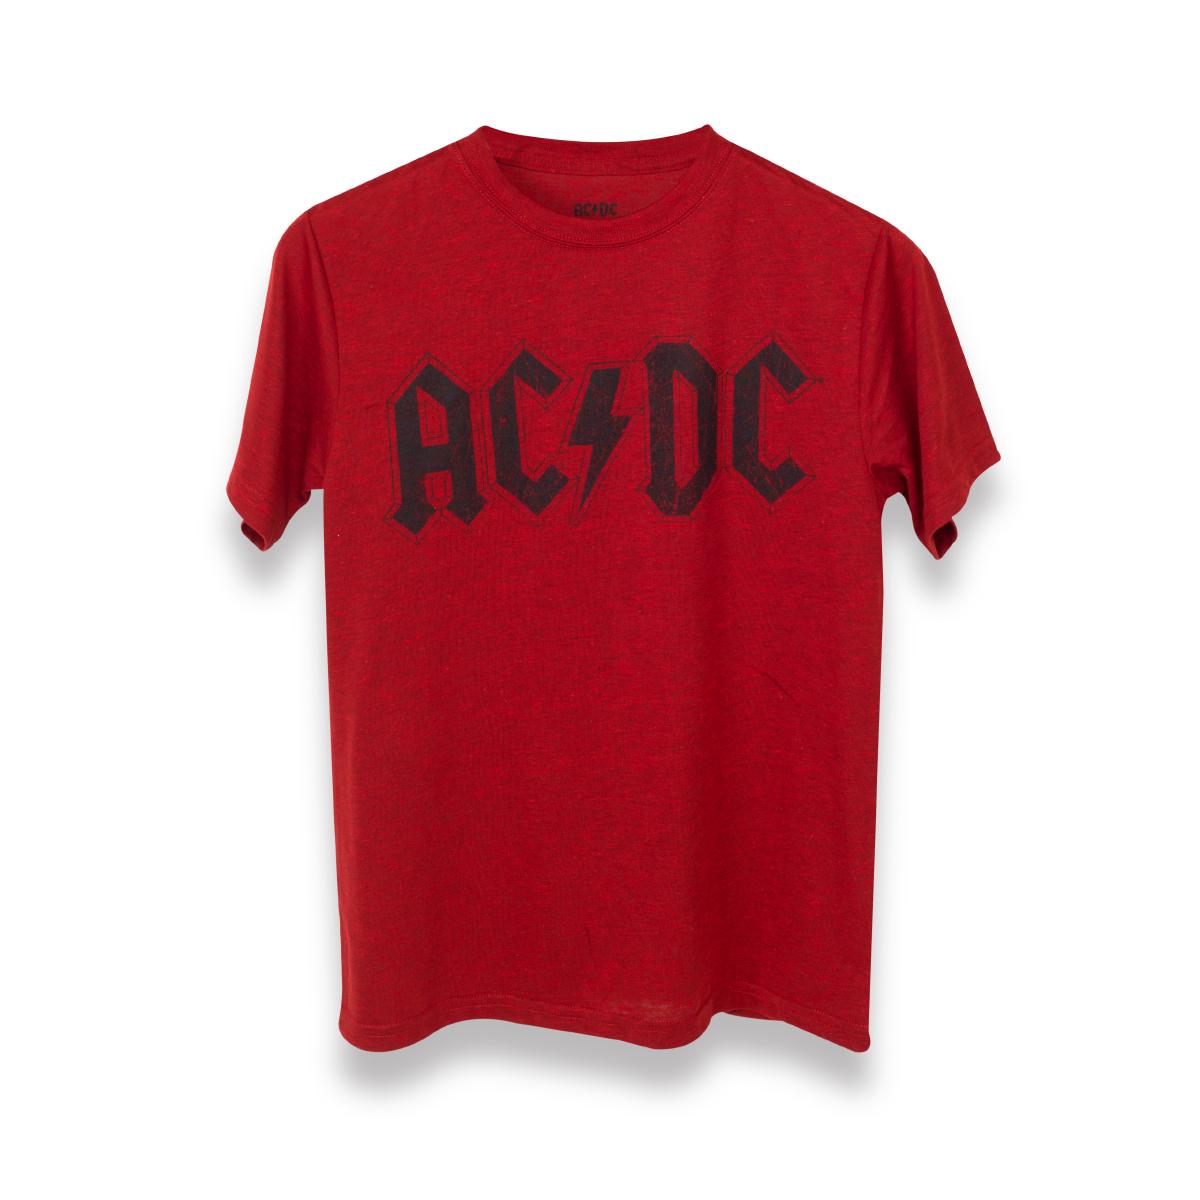 ac dc black logo red kids t shirt shop the ac dc. Black Bedroom Furniture Sets. Home Design Ideas